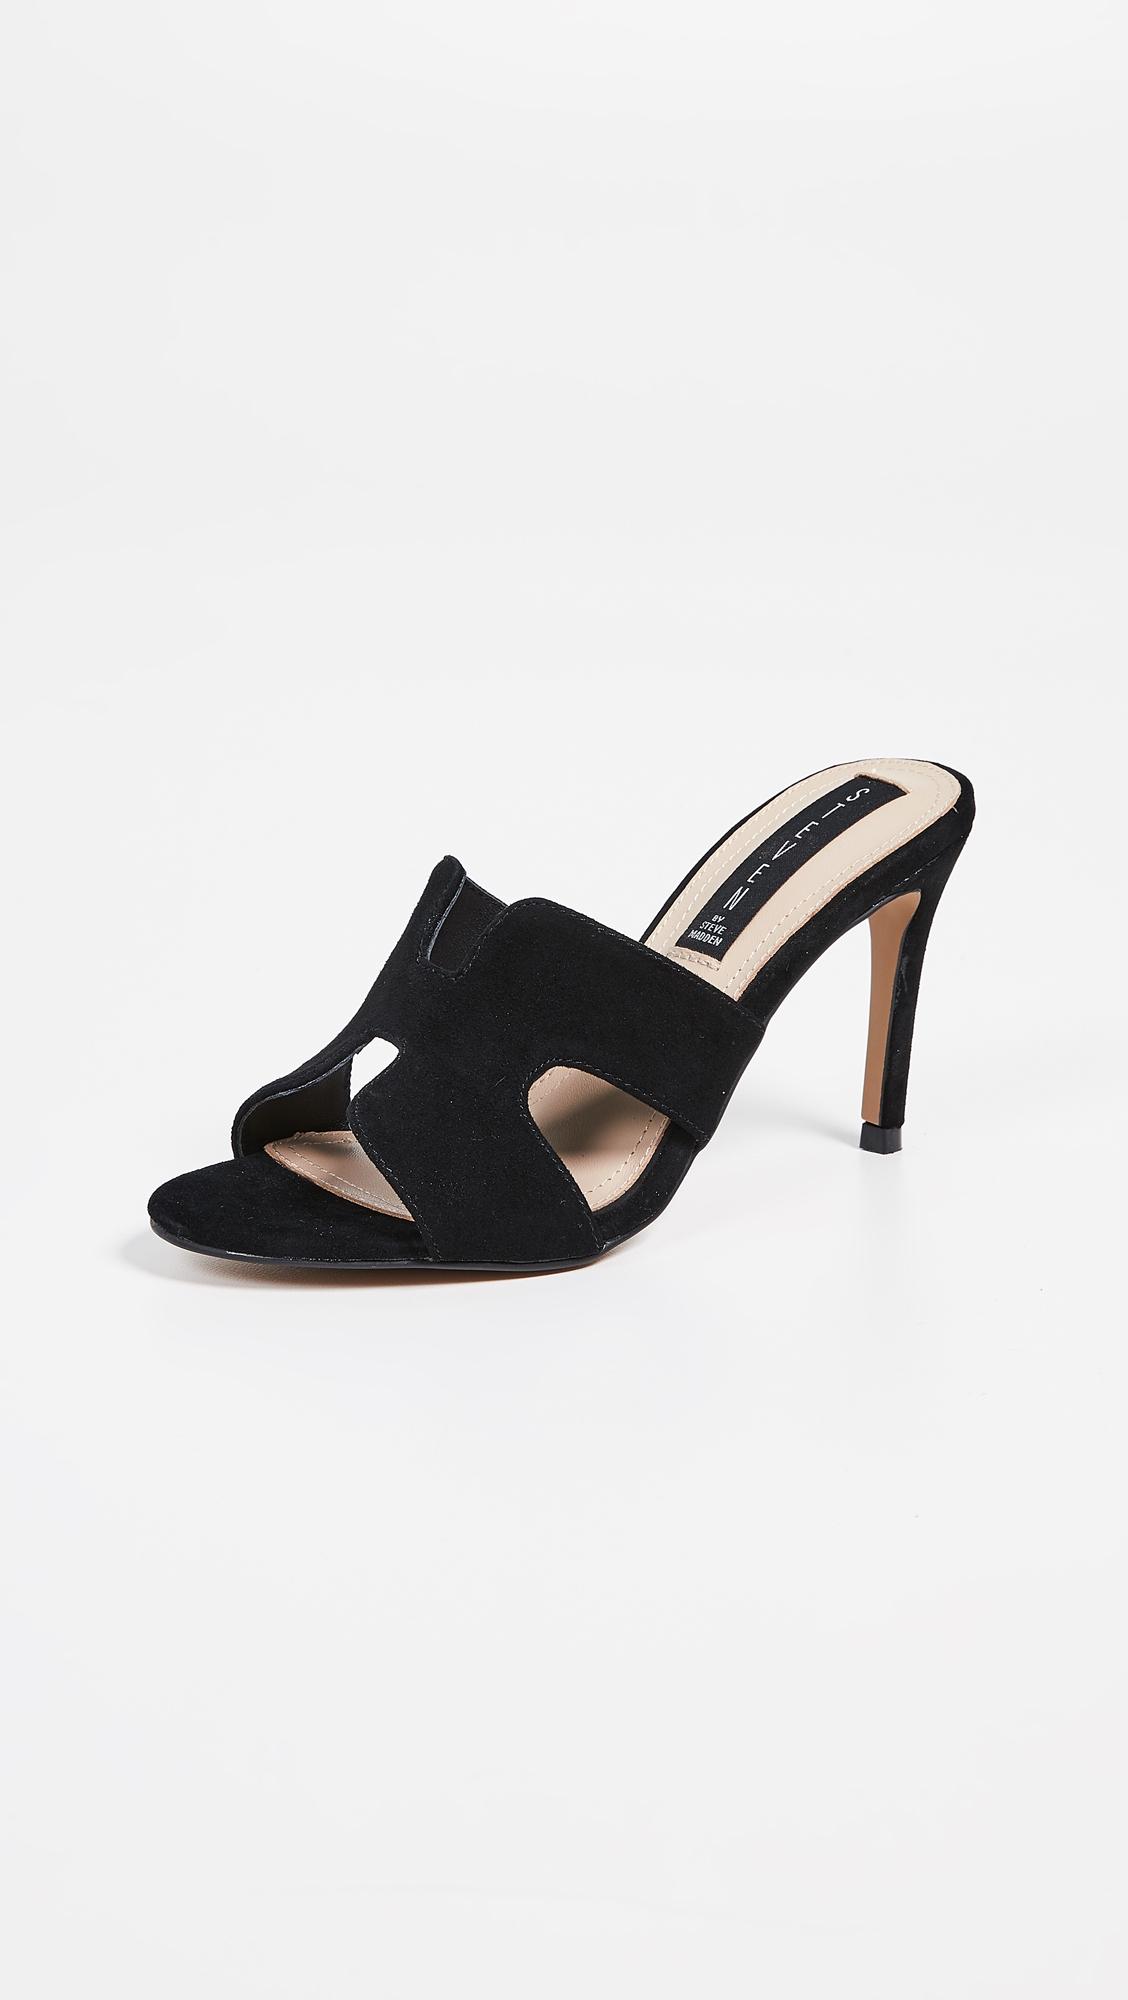 Nylah Mules Heels Black Dress Sandals Steve Madden Shoes